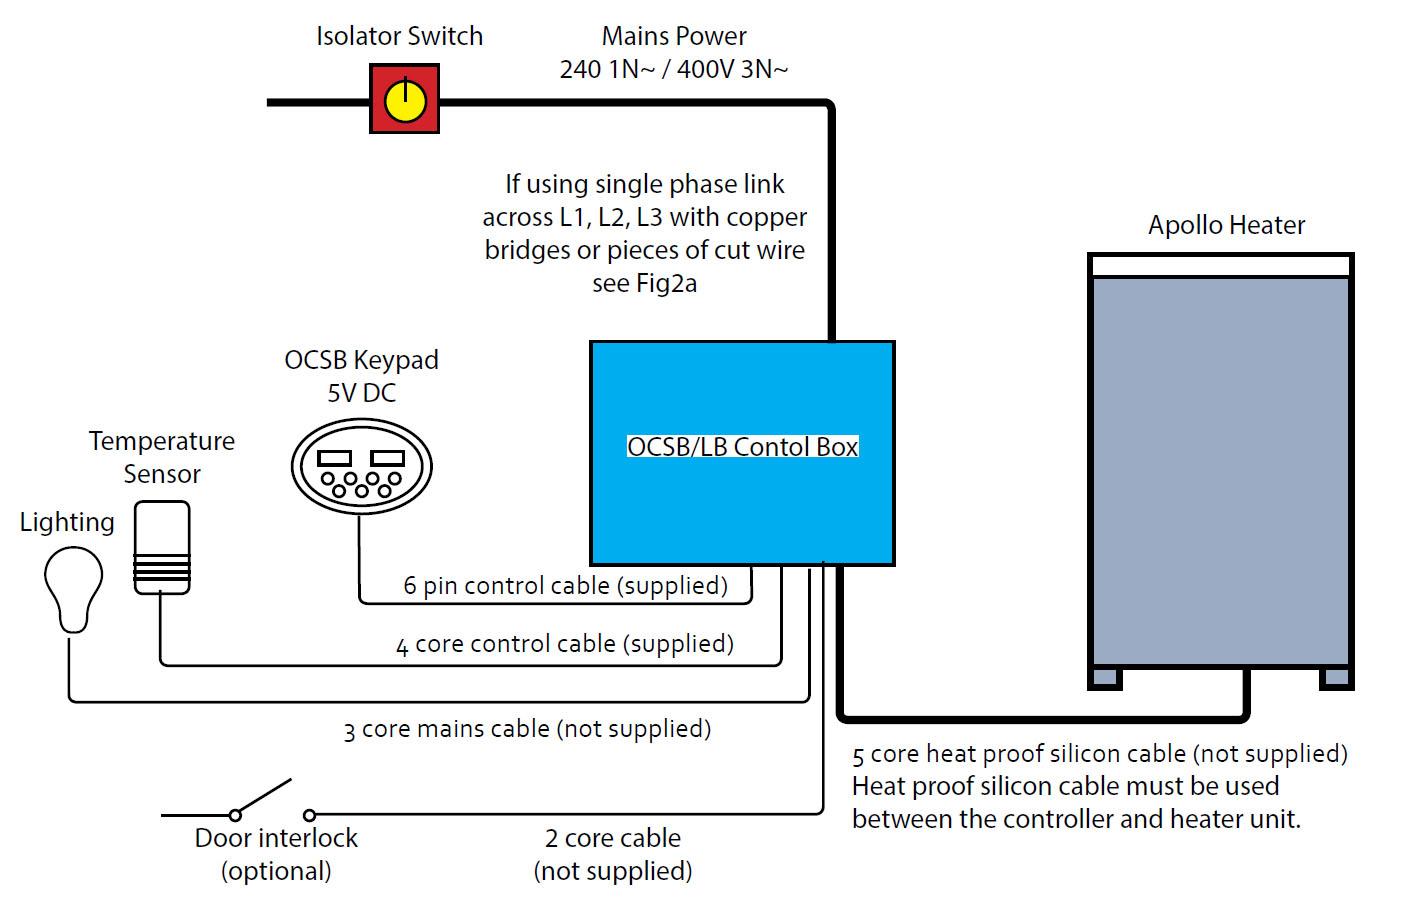 🏆 [DIAGRAM in Pictures Database] 950 Apollo Keypad Wiring Diagram Just  Download or Read Wiring Diagram - MINA.OUMASSAOUD.BI-WIRING -SPEAKERS.ONYXUM.COMComplete Diagram Picture Database - Onyxum.com